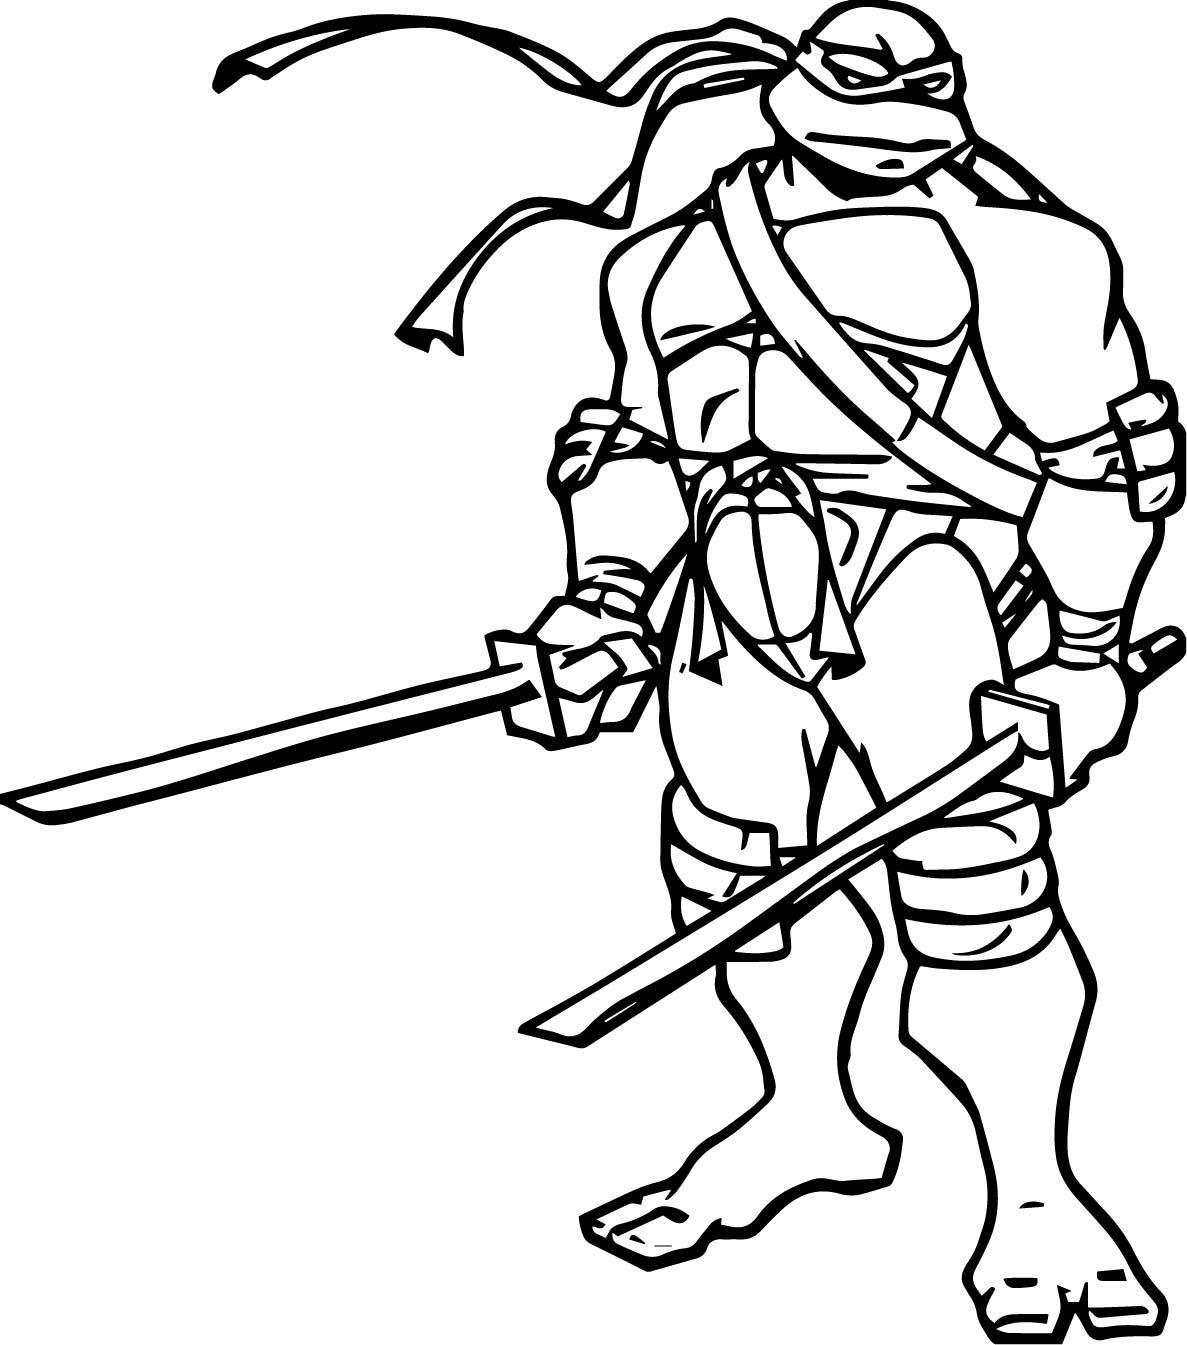 Cool Ninja Turtle Two Blade Leonardo Coloring Page Turtle Coloring Pages Ninja Turtle Coloring Pages Leonardo Ninja Turtle